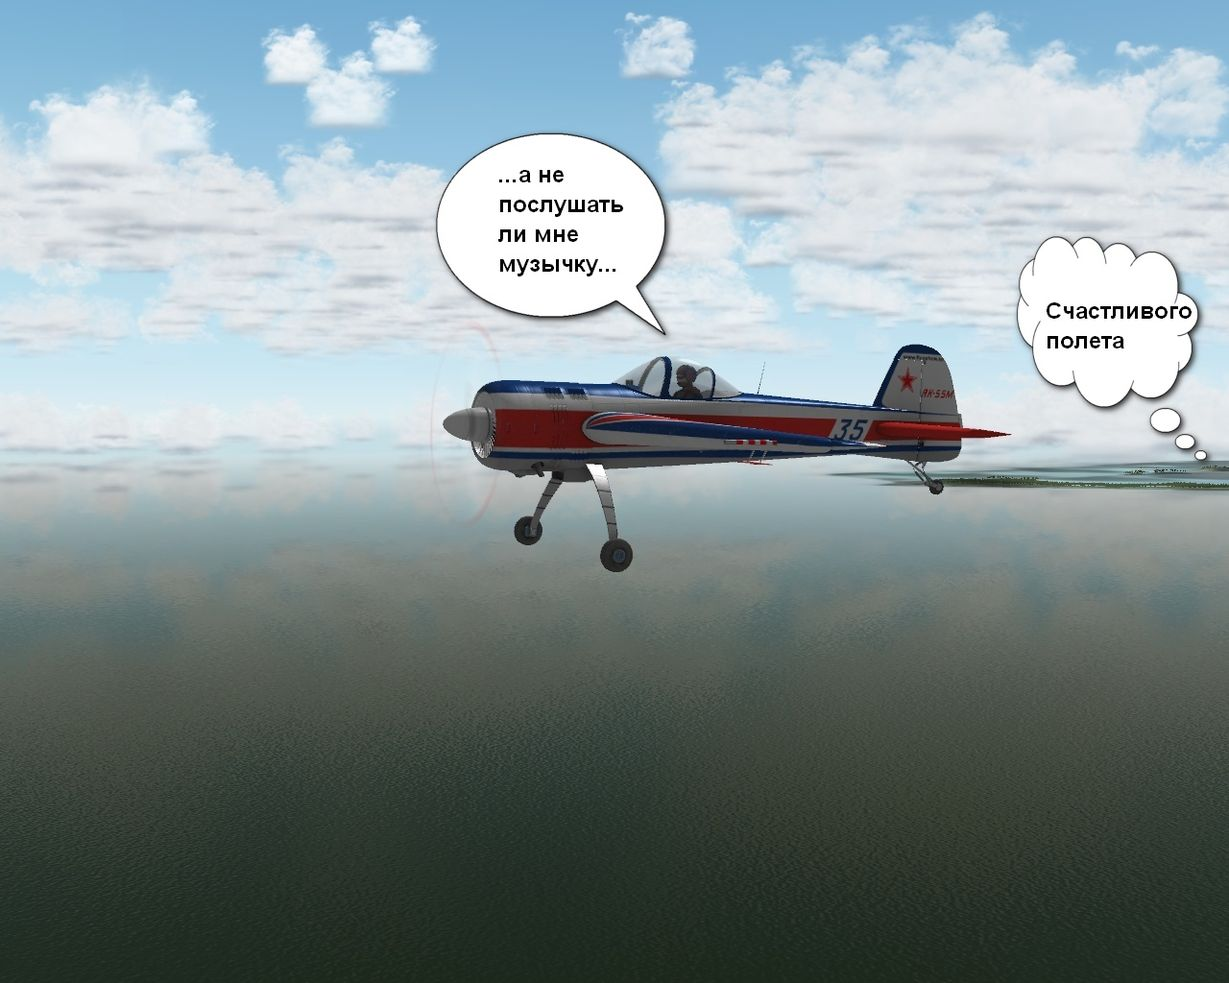 включения отключения счастливого полета и мягкой посадки картинки дня ванесса миннилло